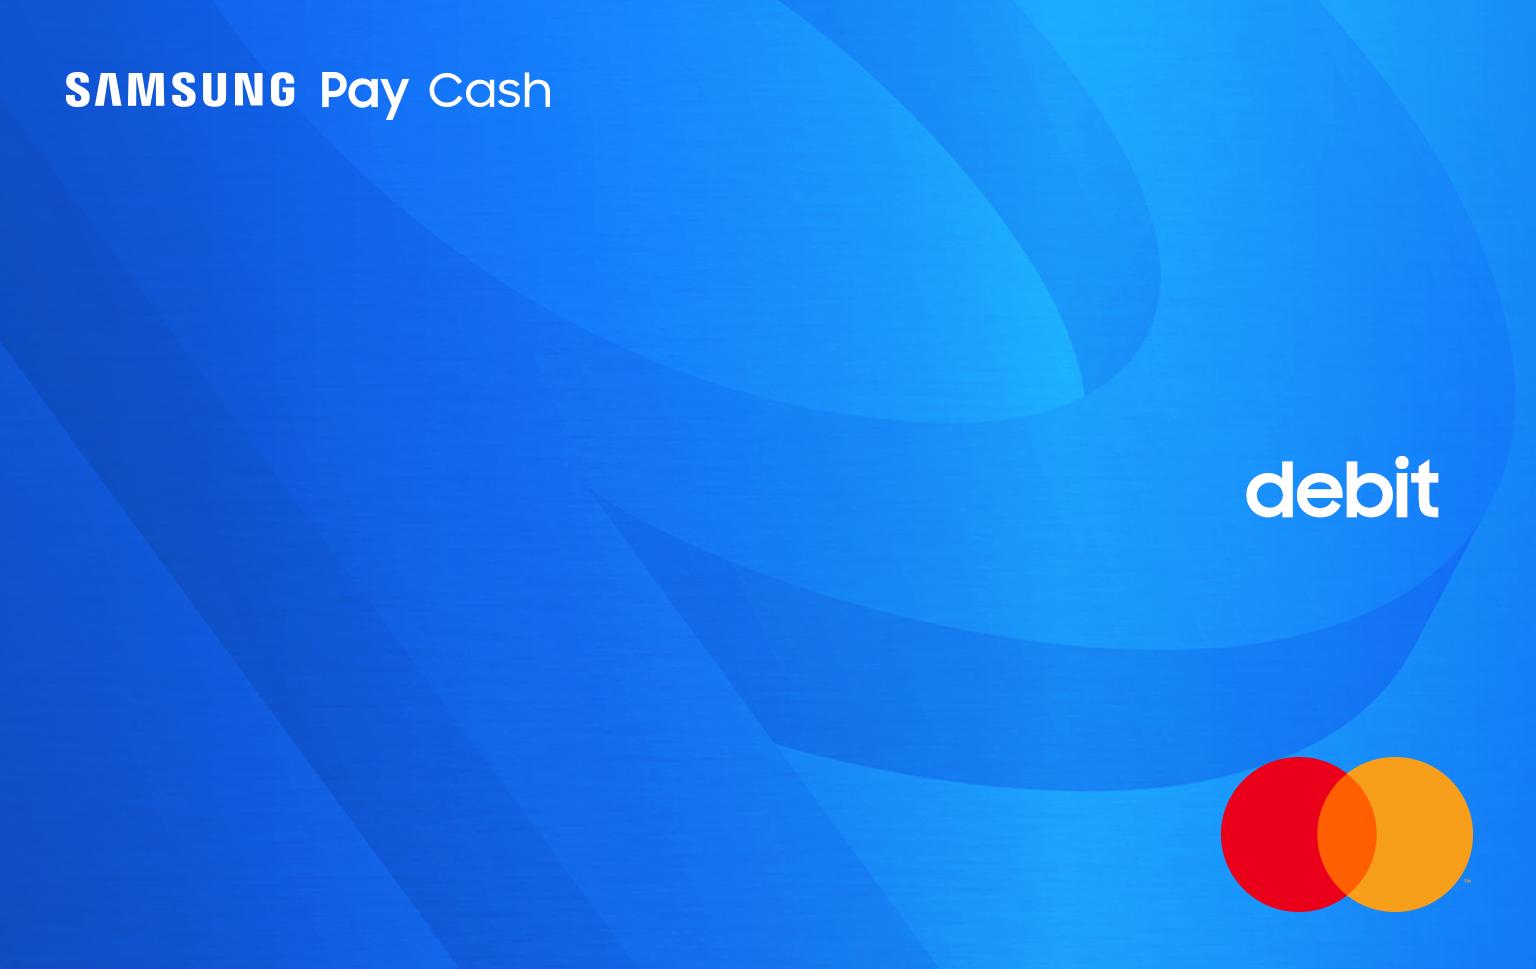 Samsung Pay Cash Debit